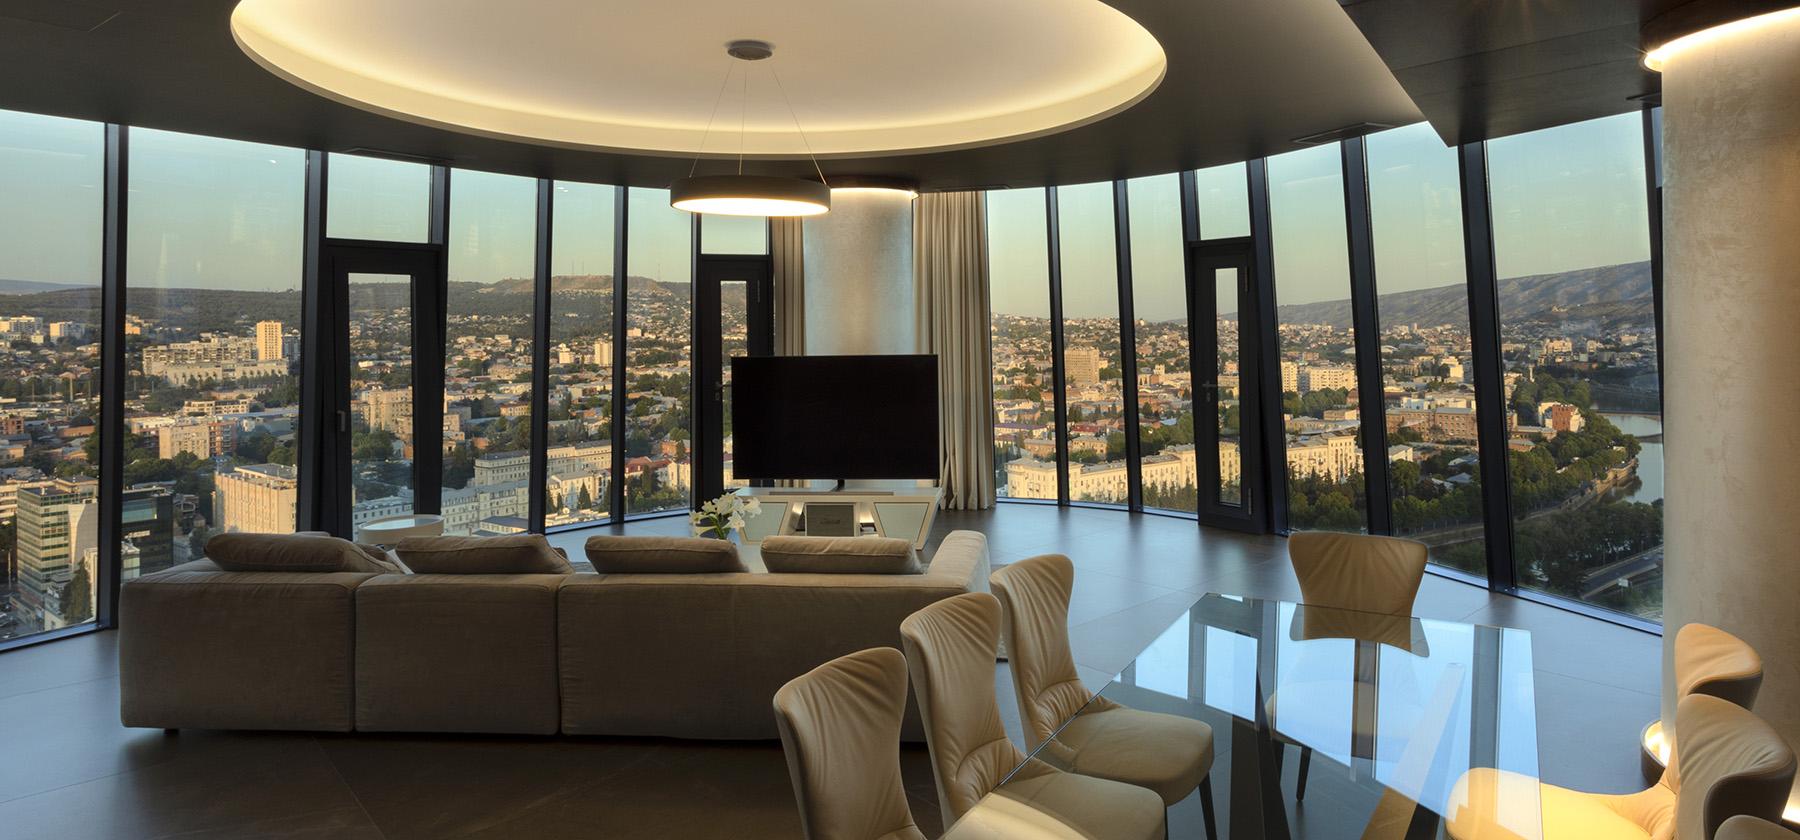 9_KingDavid_tartan_interior_wall_covering